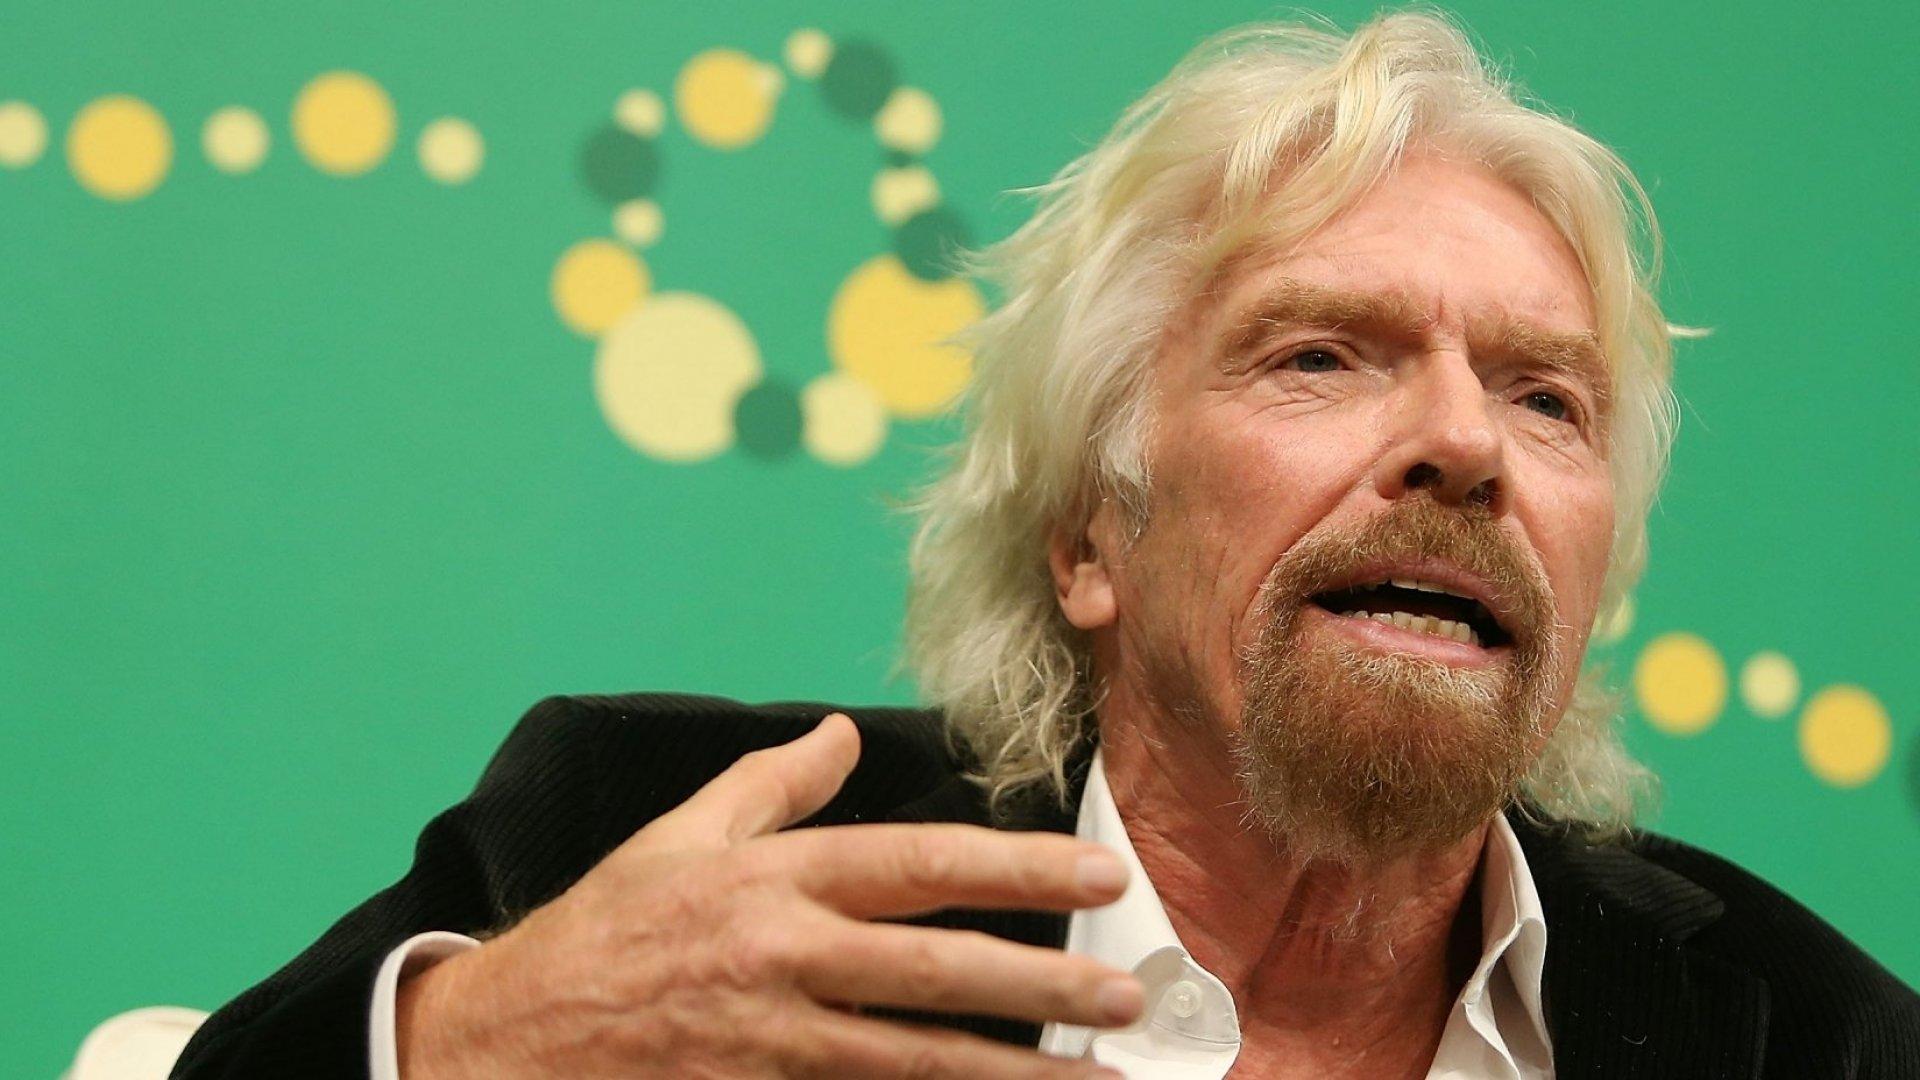 Richard Branson, Elon Musk, Peter Thiel and Other Successful Entrepreneurs' Favorite Interview Questions